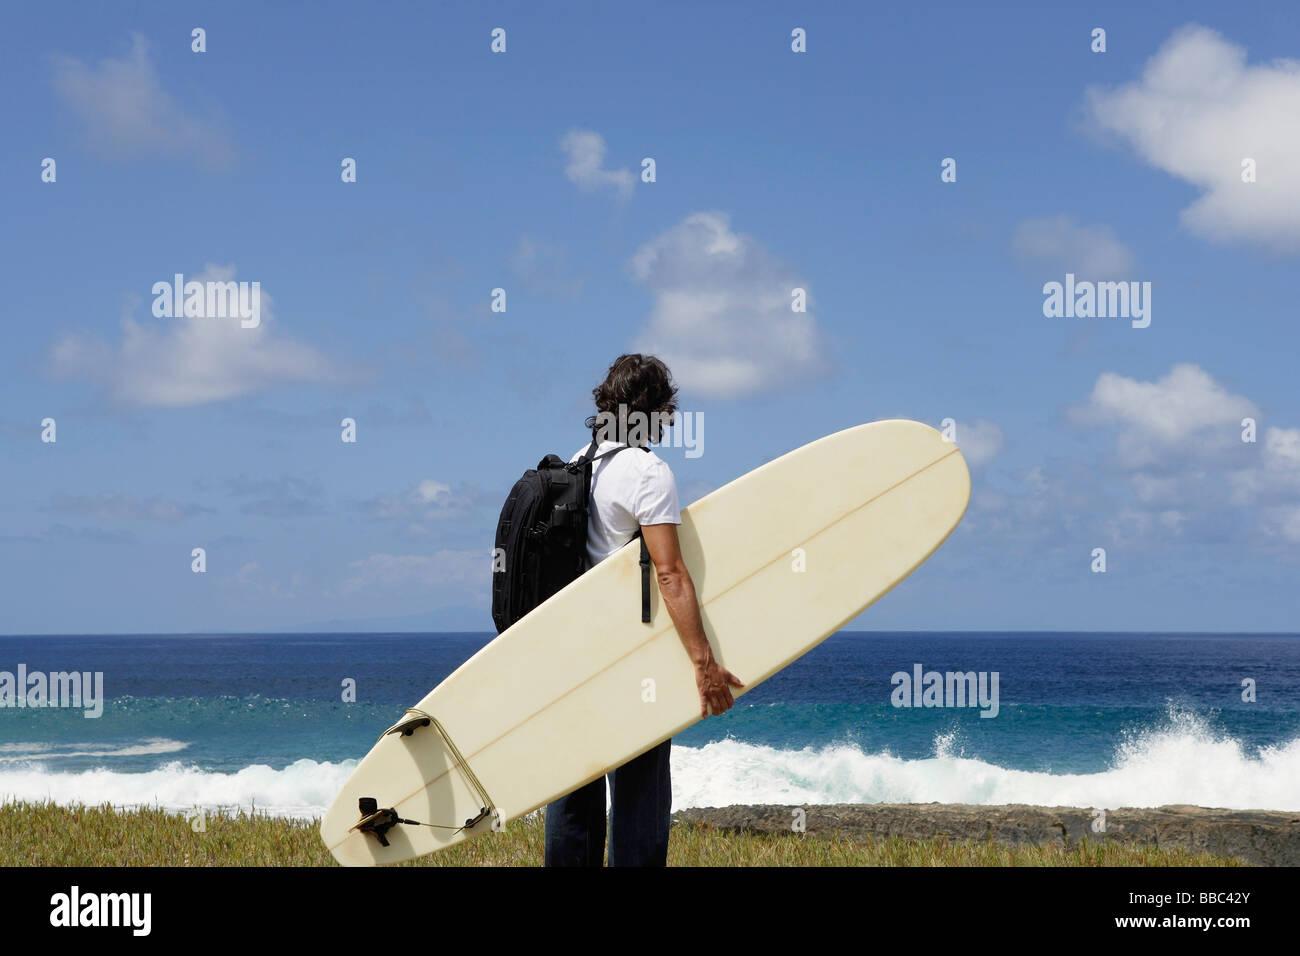 man holding surf board, facing sea - Stock Image